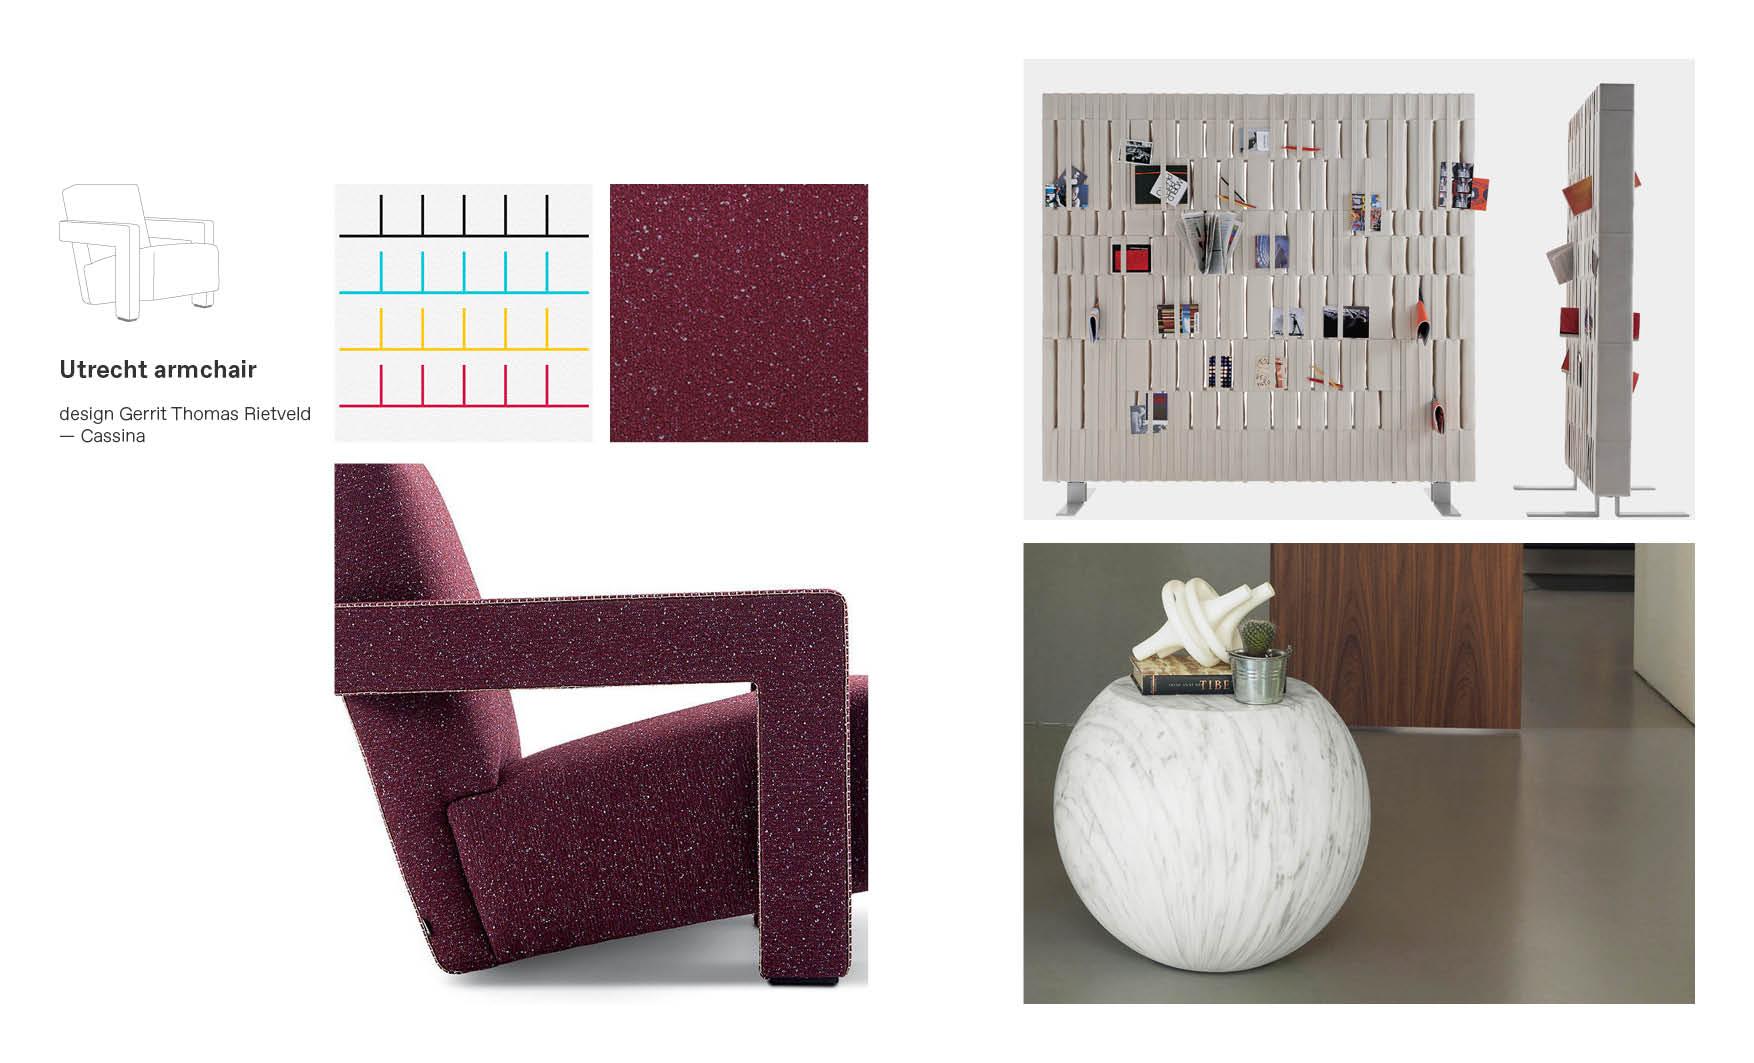 Utrecht Cassina armchair moodboard composition